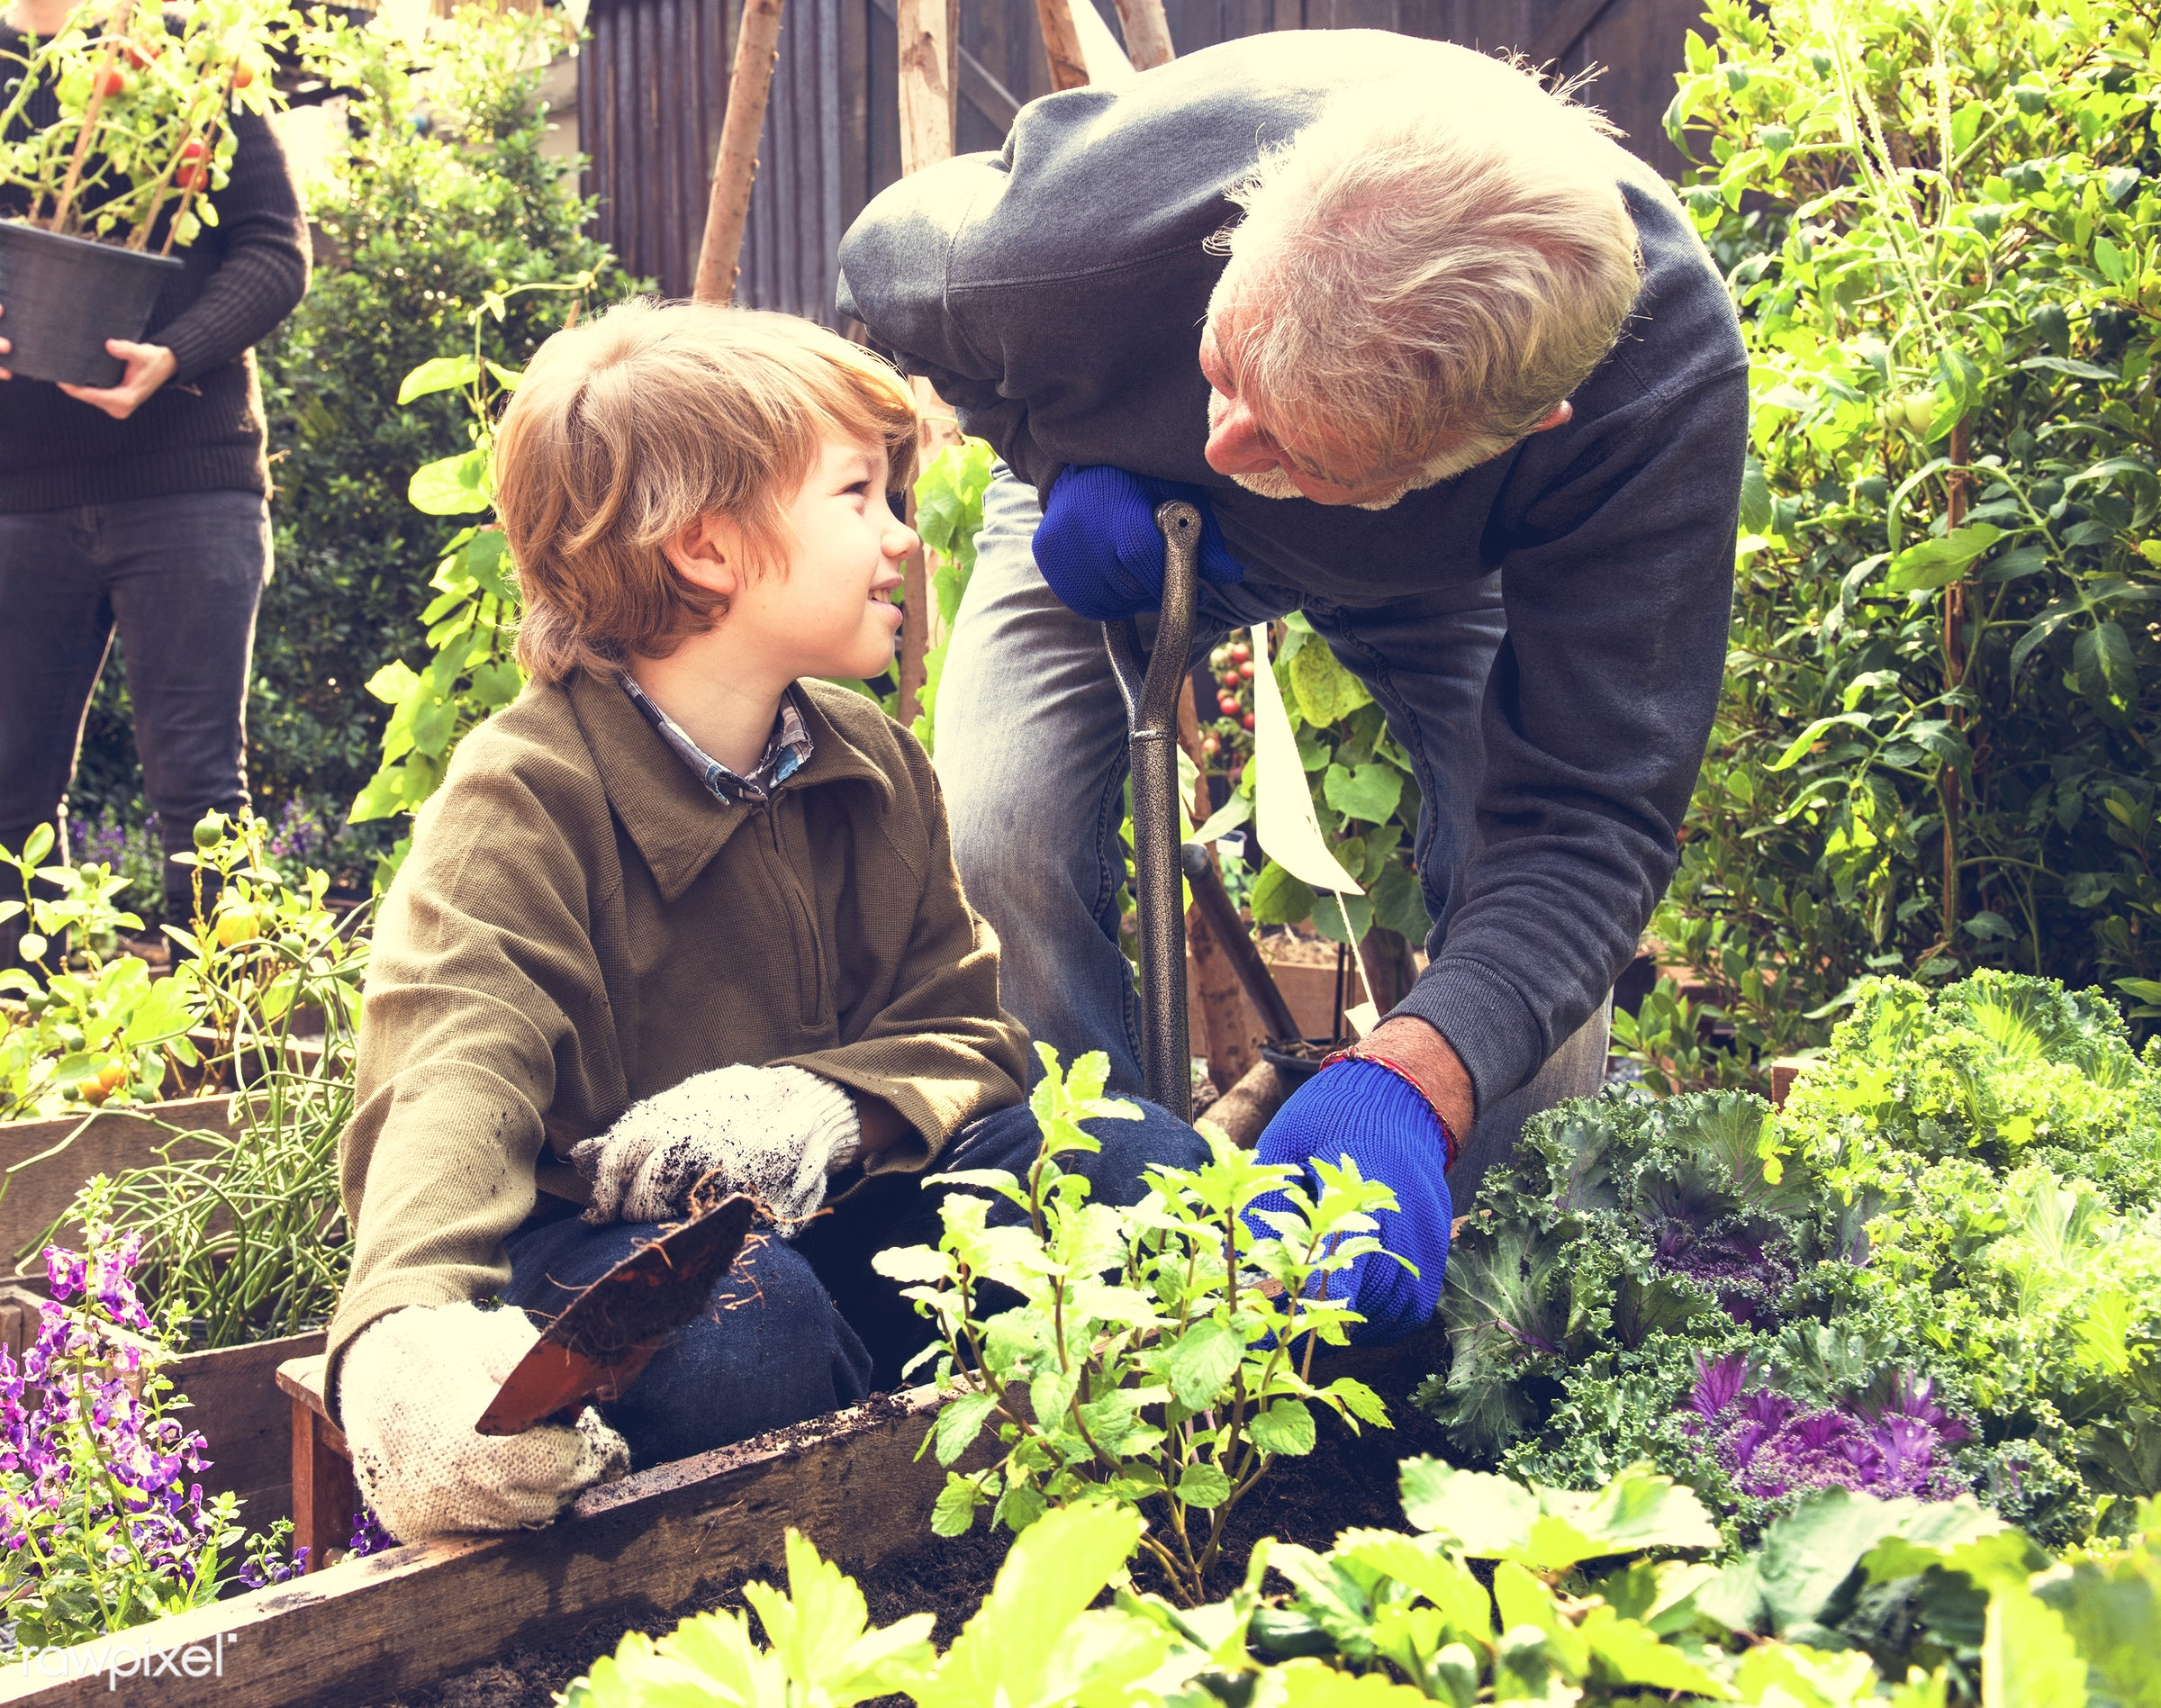 countryside, person, greenhouse, botanical, plantation, caucasian, kid, tree, nature, family, lifestyle, backyard, working,...